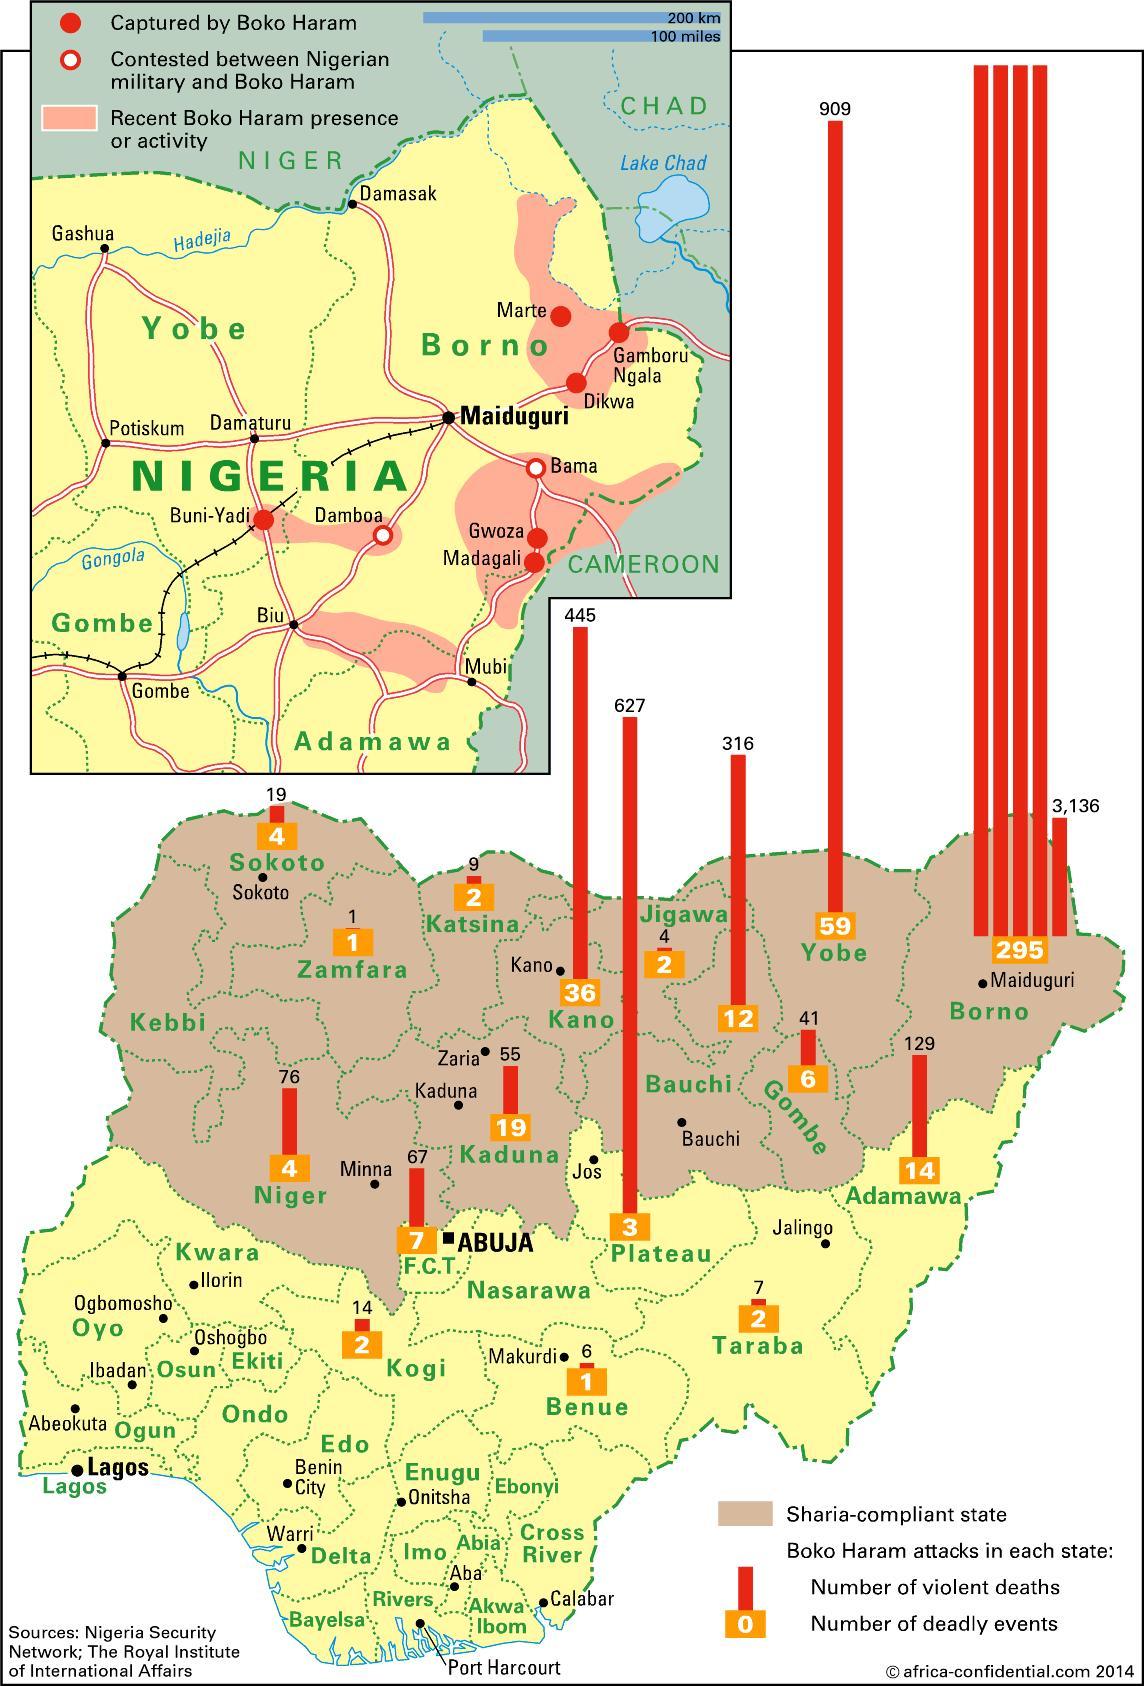 Adama, Nigeria Africa Map | Biofocuscommunicatie